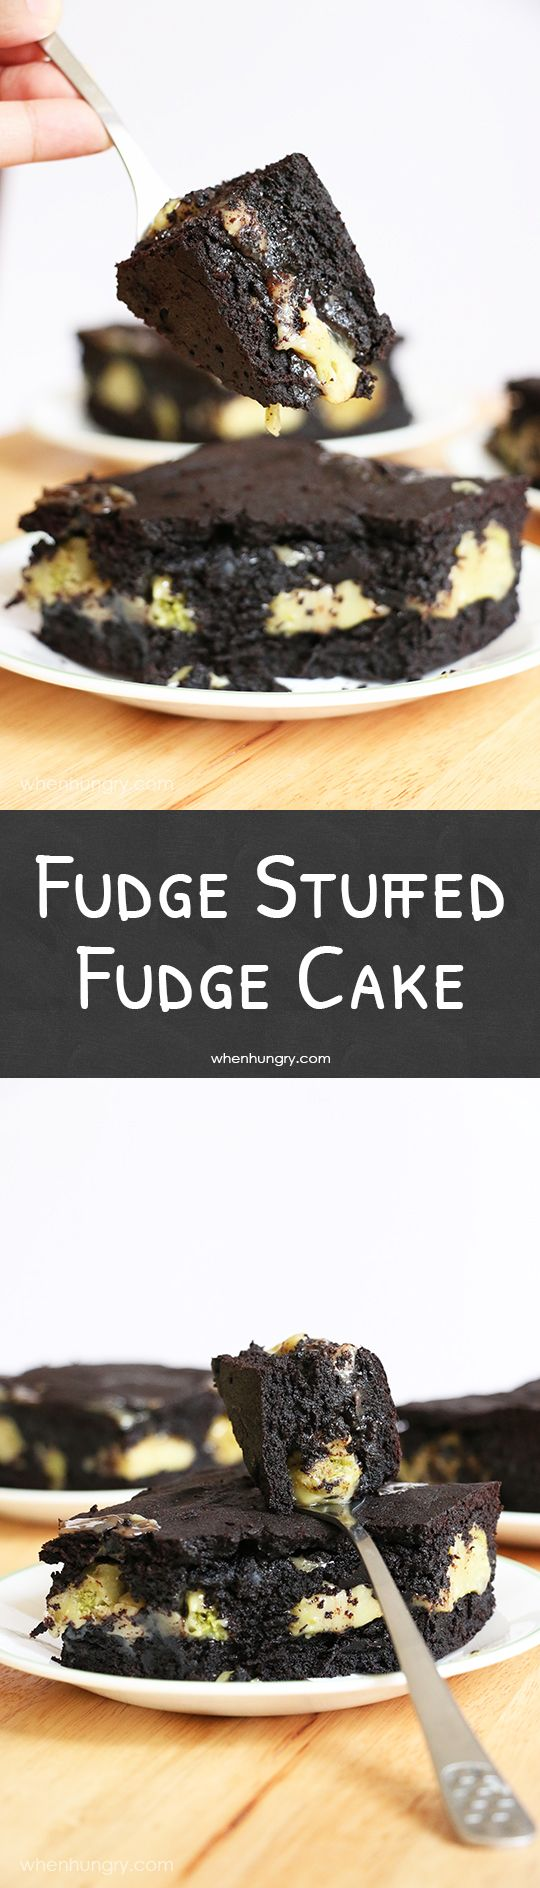 Fudge Stuffed Fudge Cake